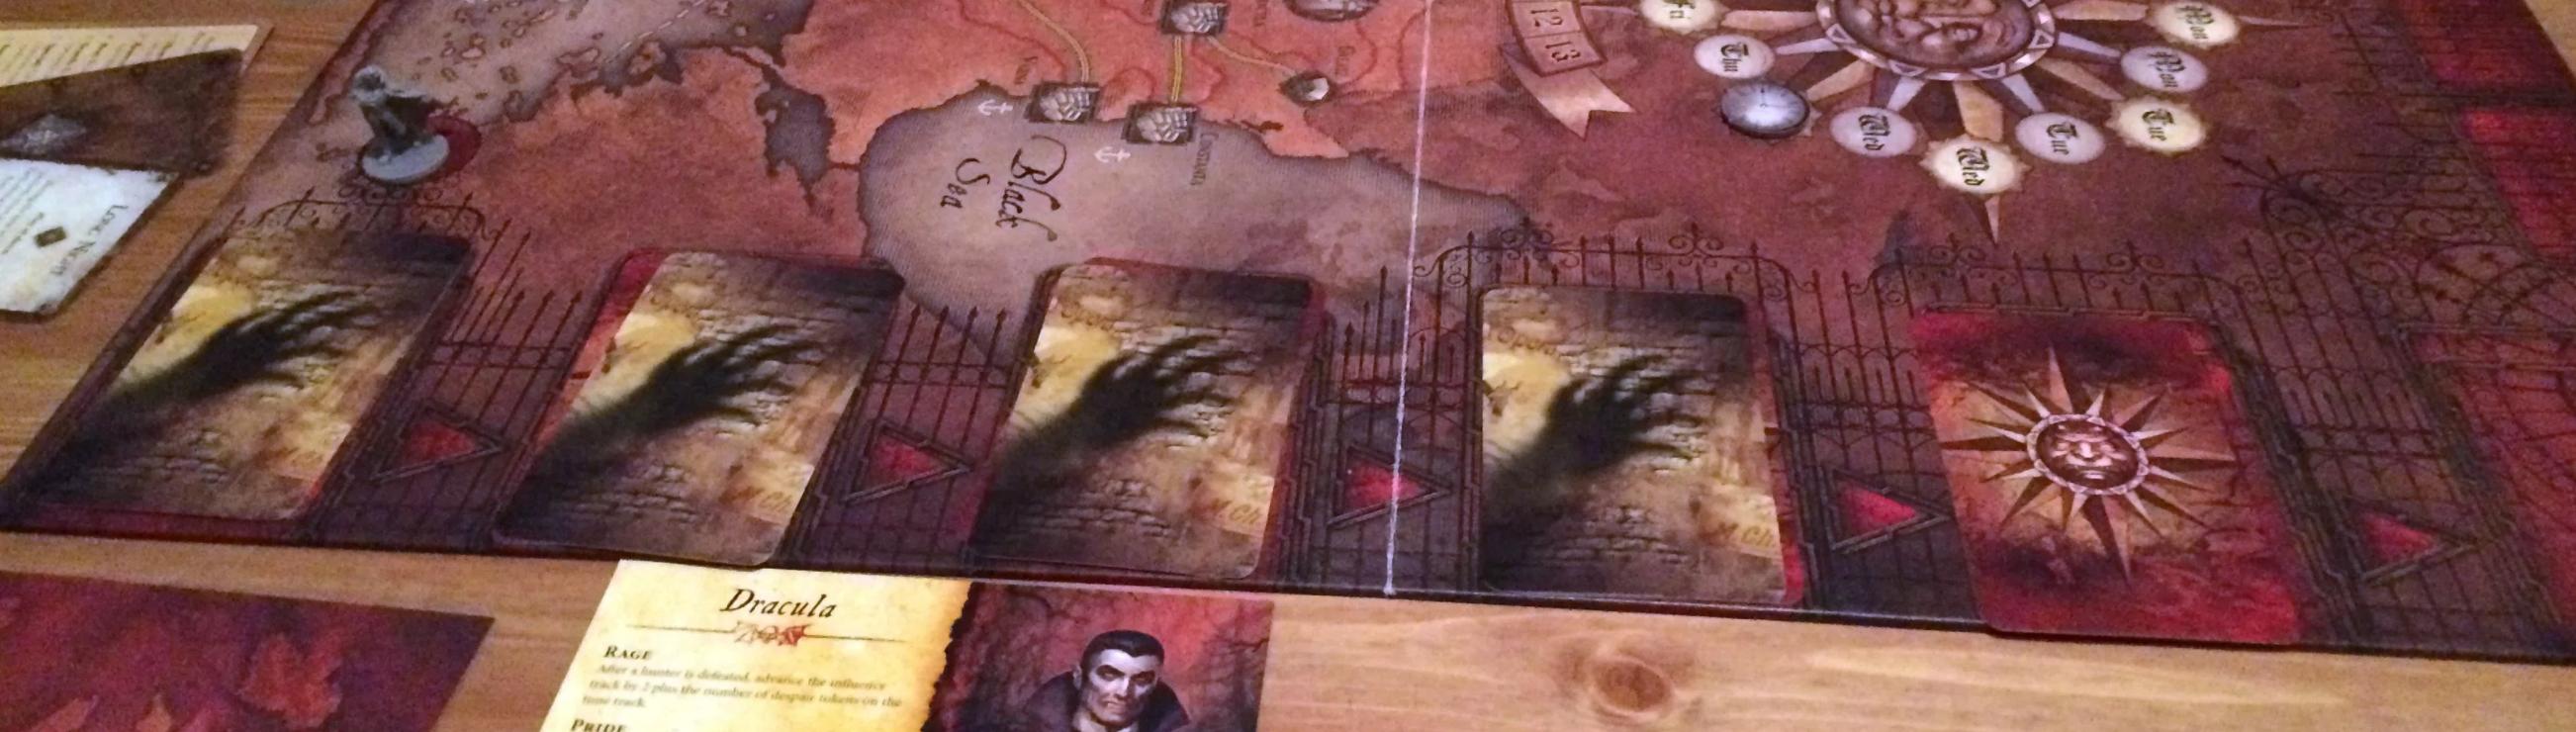 Dracula's Hideouts